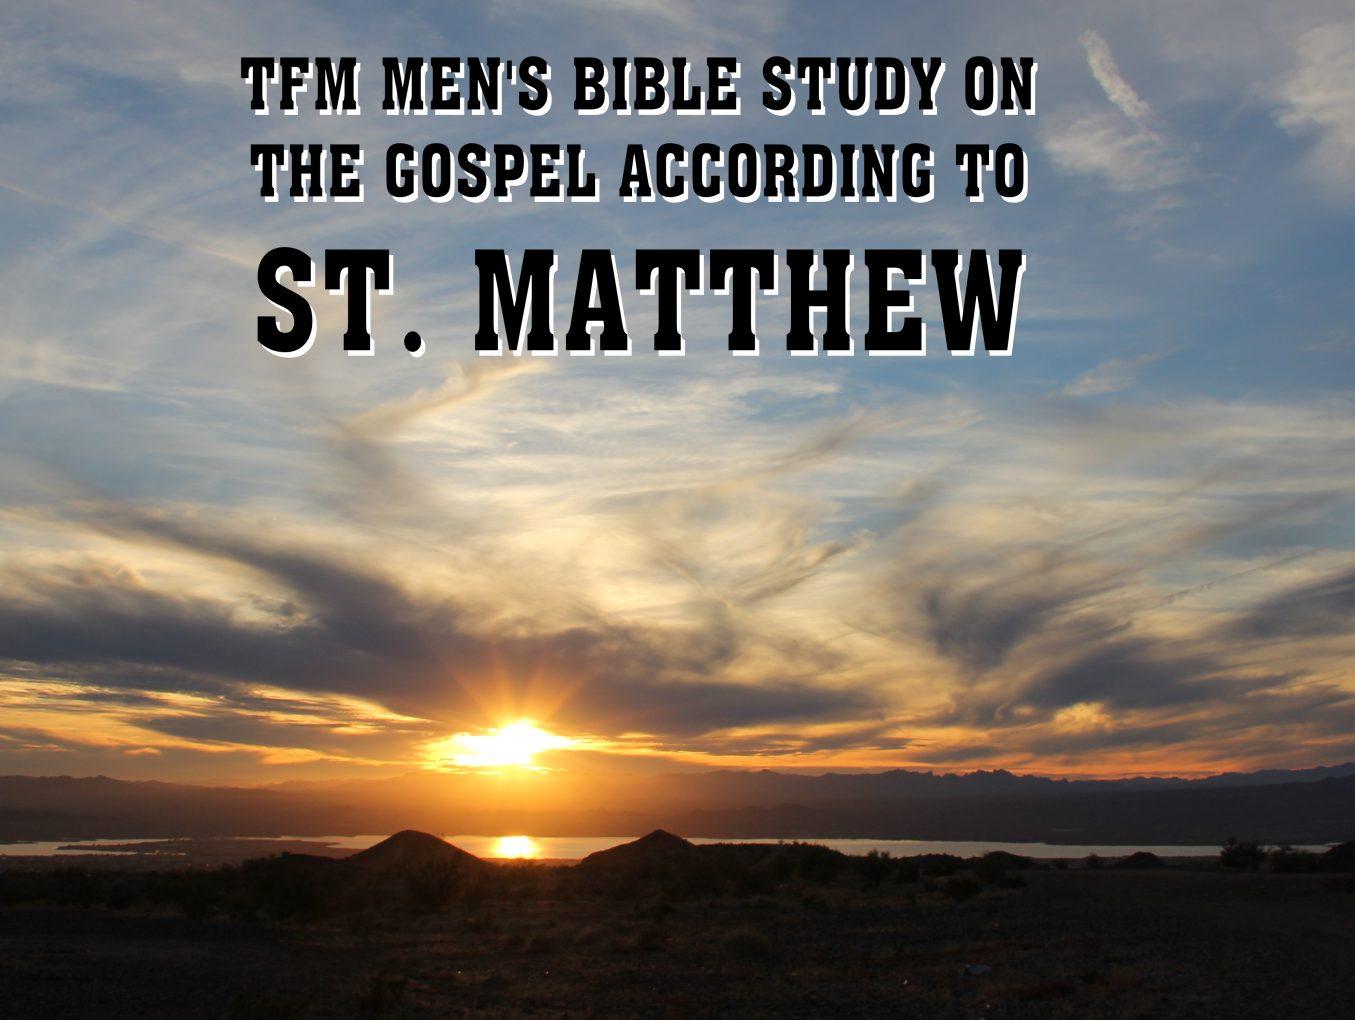 Men's Bible Study on MATTHEW (2015-02-17 to 2016-01-05)